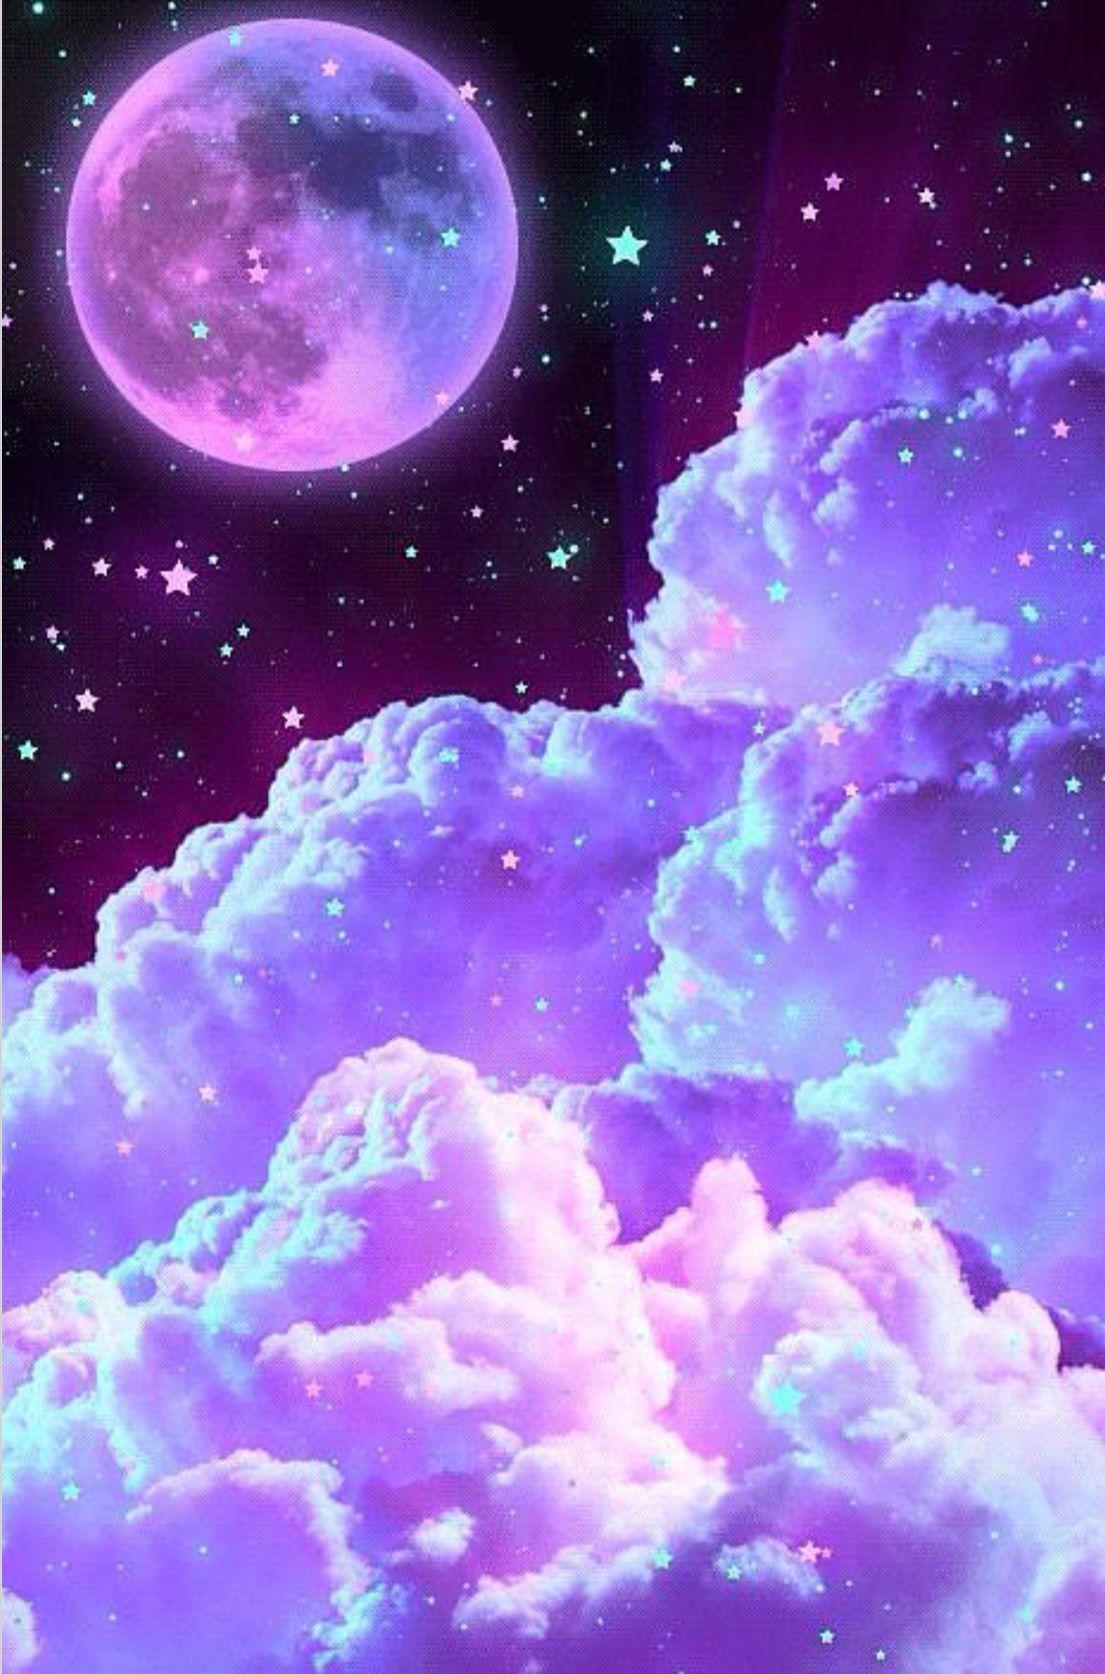 Pin By Kitti On Favorite Artwork Galaxy Wallpaper Pretty Wallpapers Cute Galaxy Wallpaper